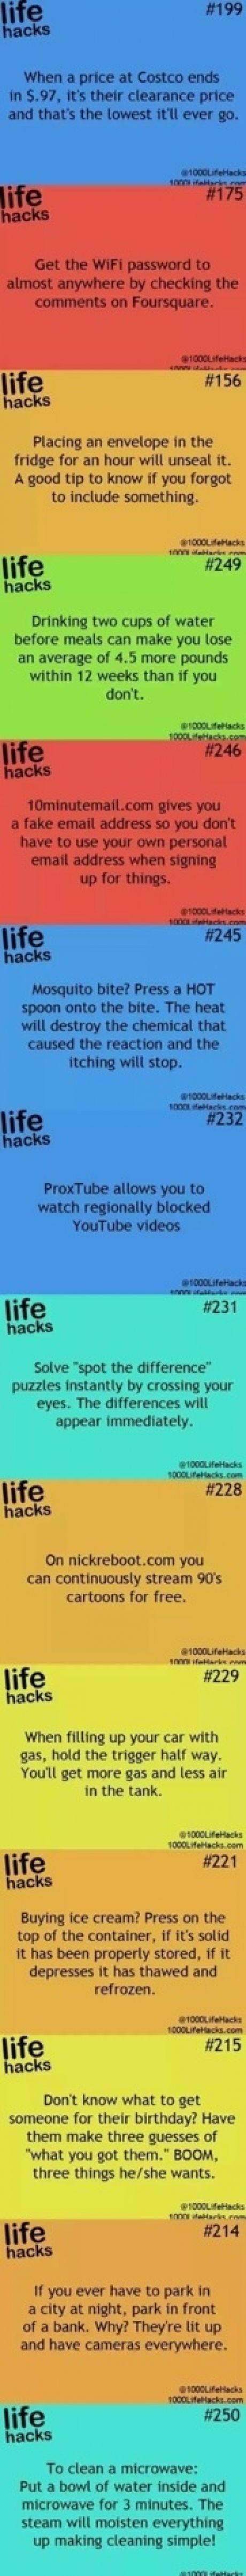 Life hacks: